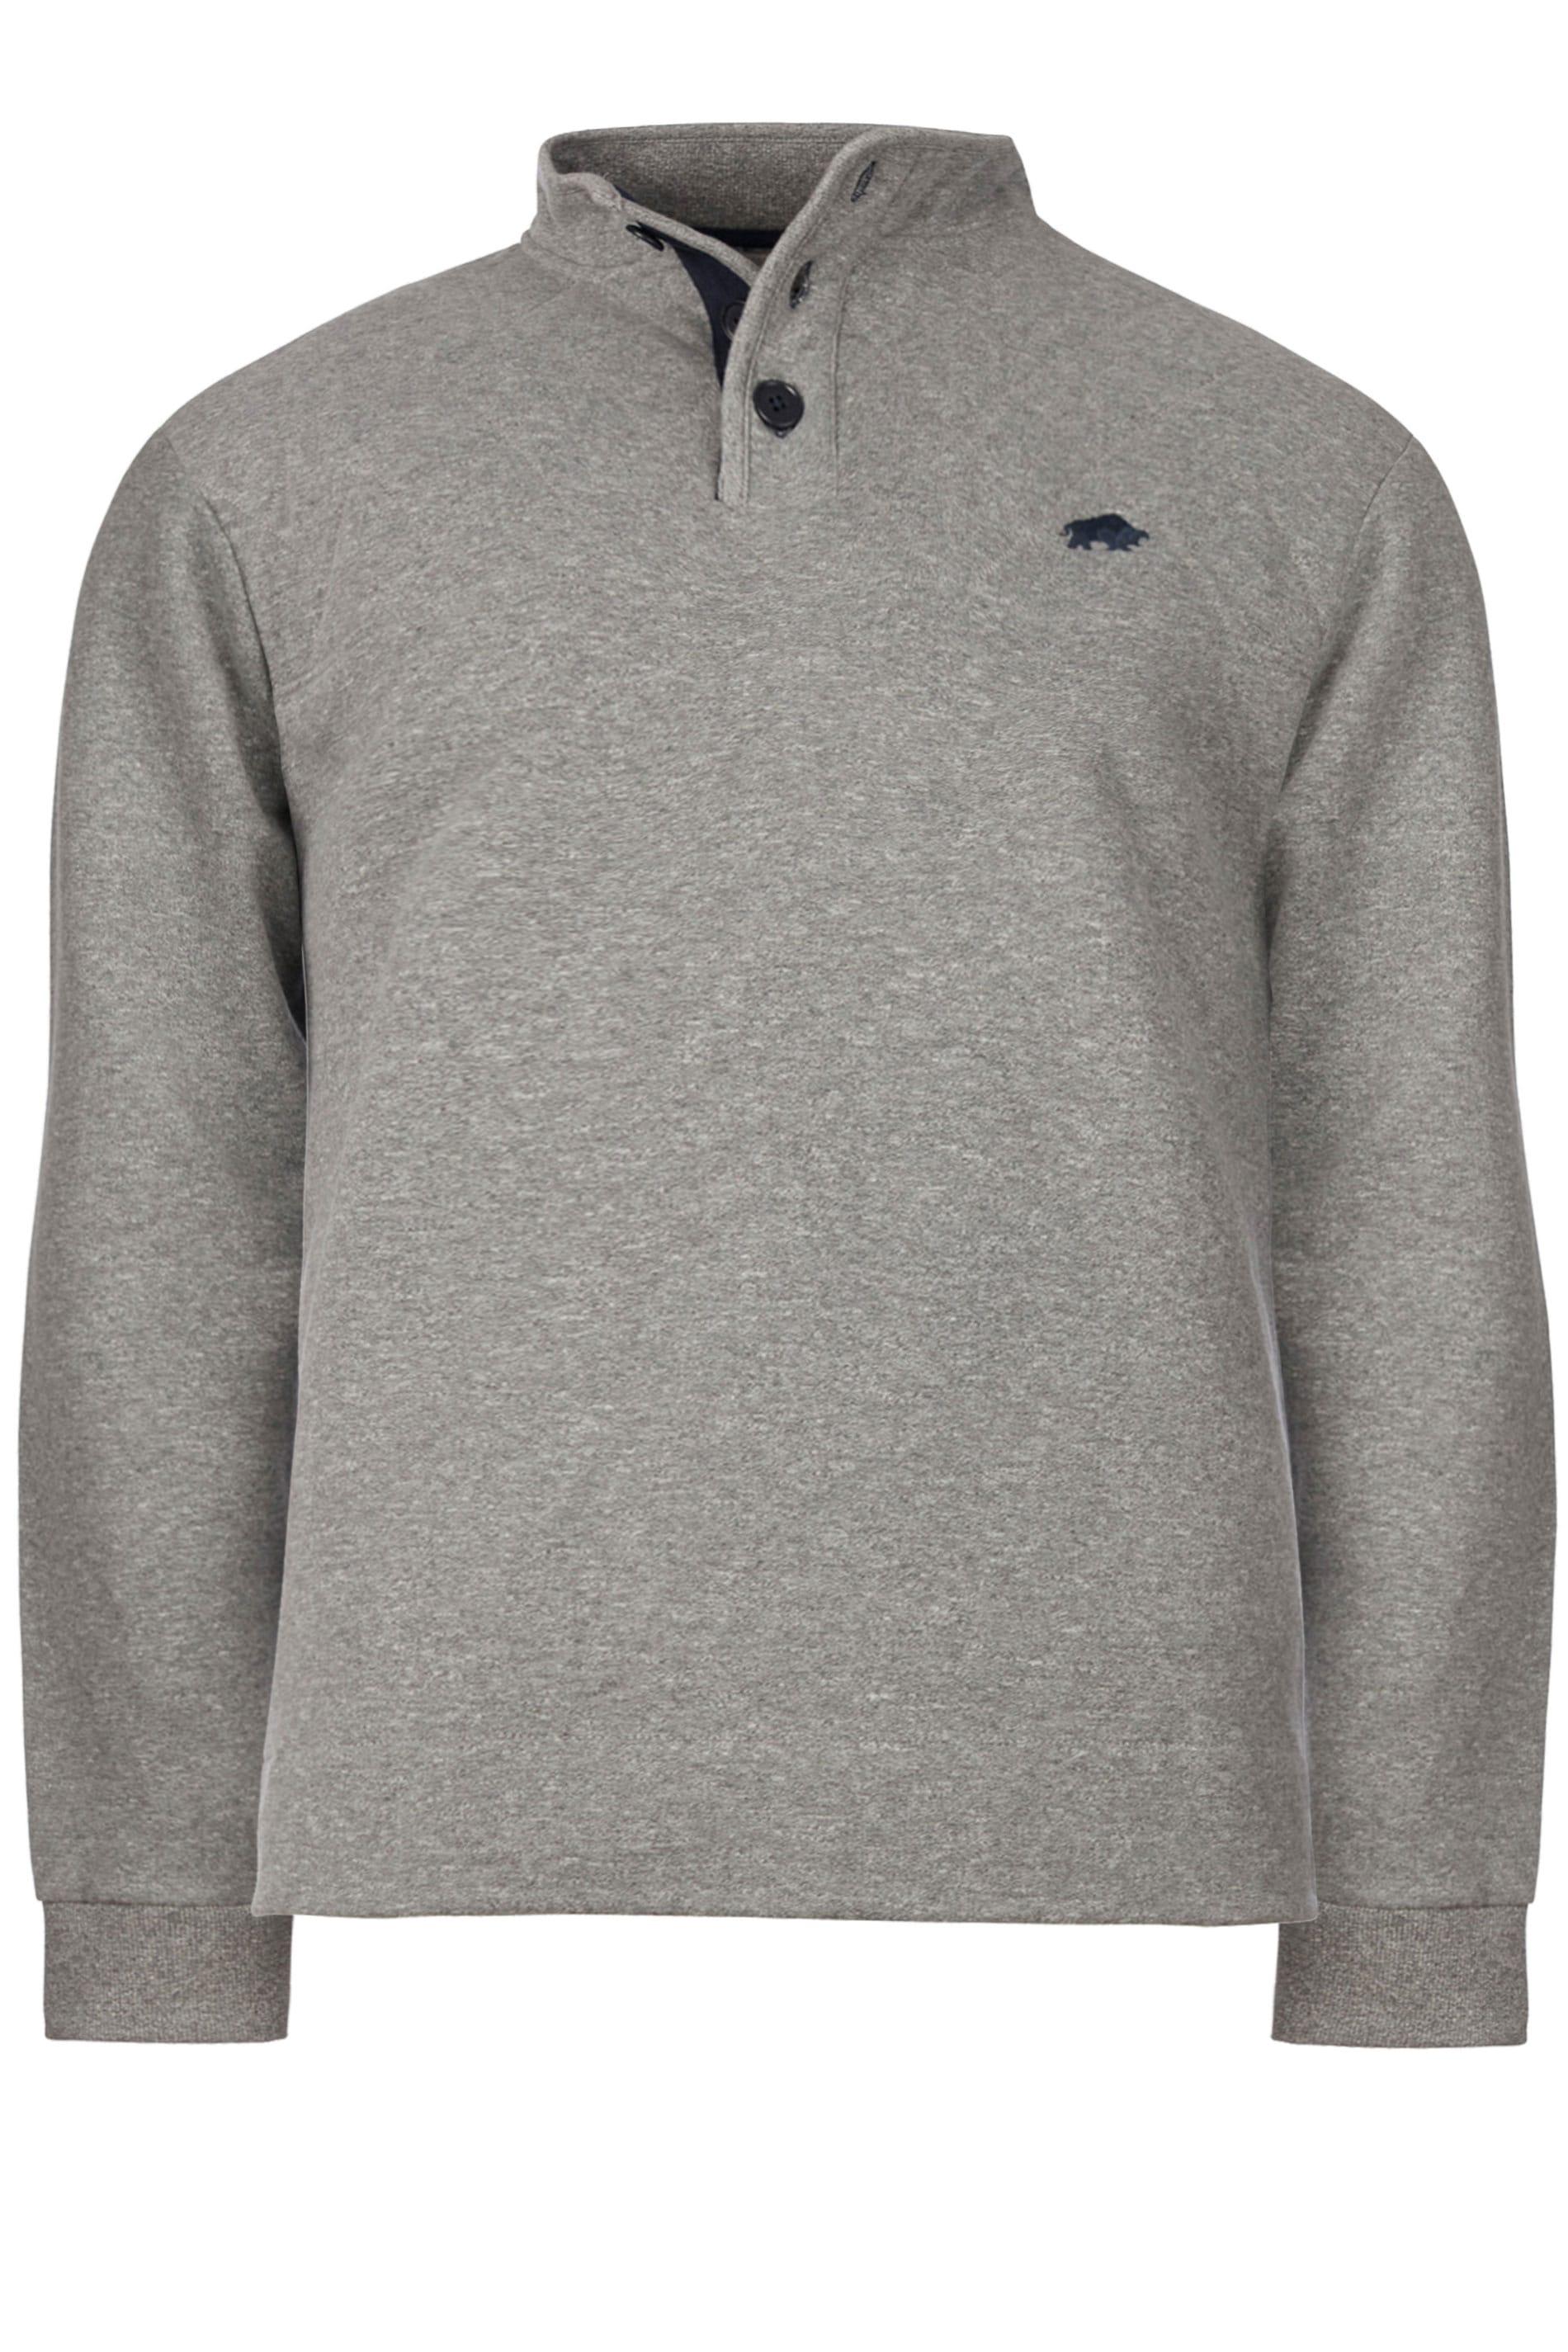 RAGING BULL Grey Signature Button Sweatshirt